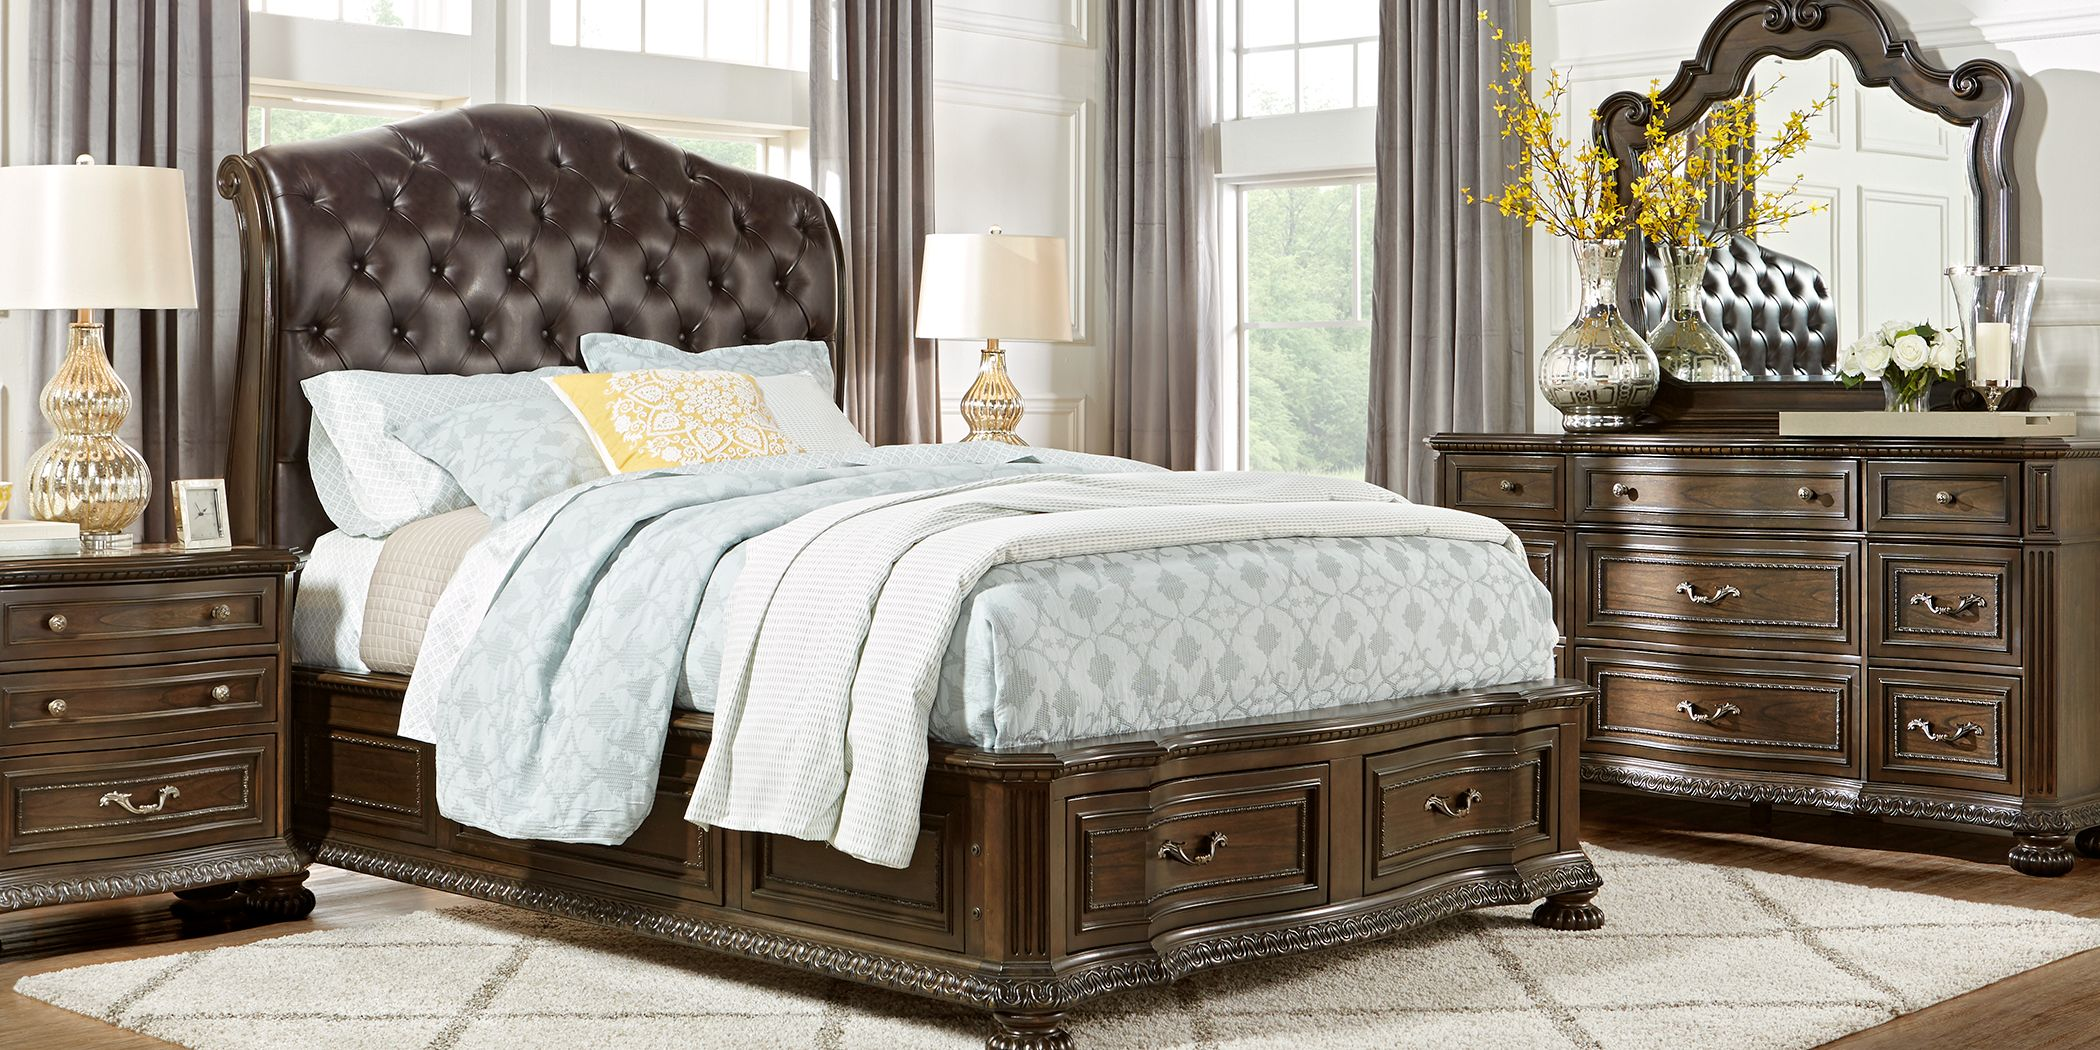 Whittington Cherry 5 Pc King Sleigh Bedroom with 4 Drawer Storage